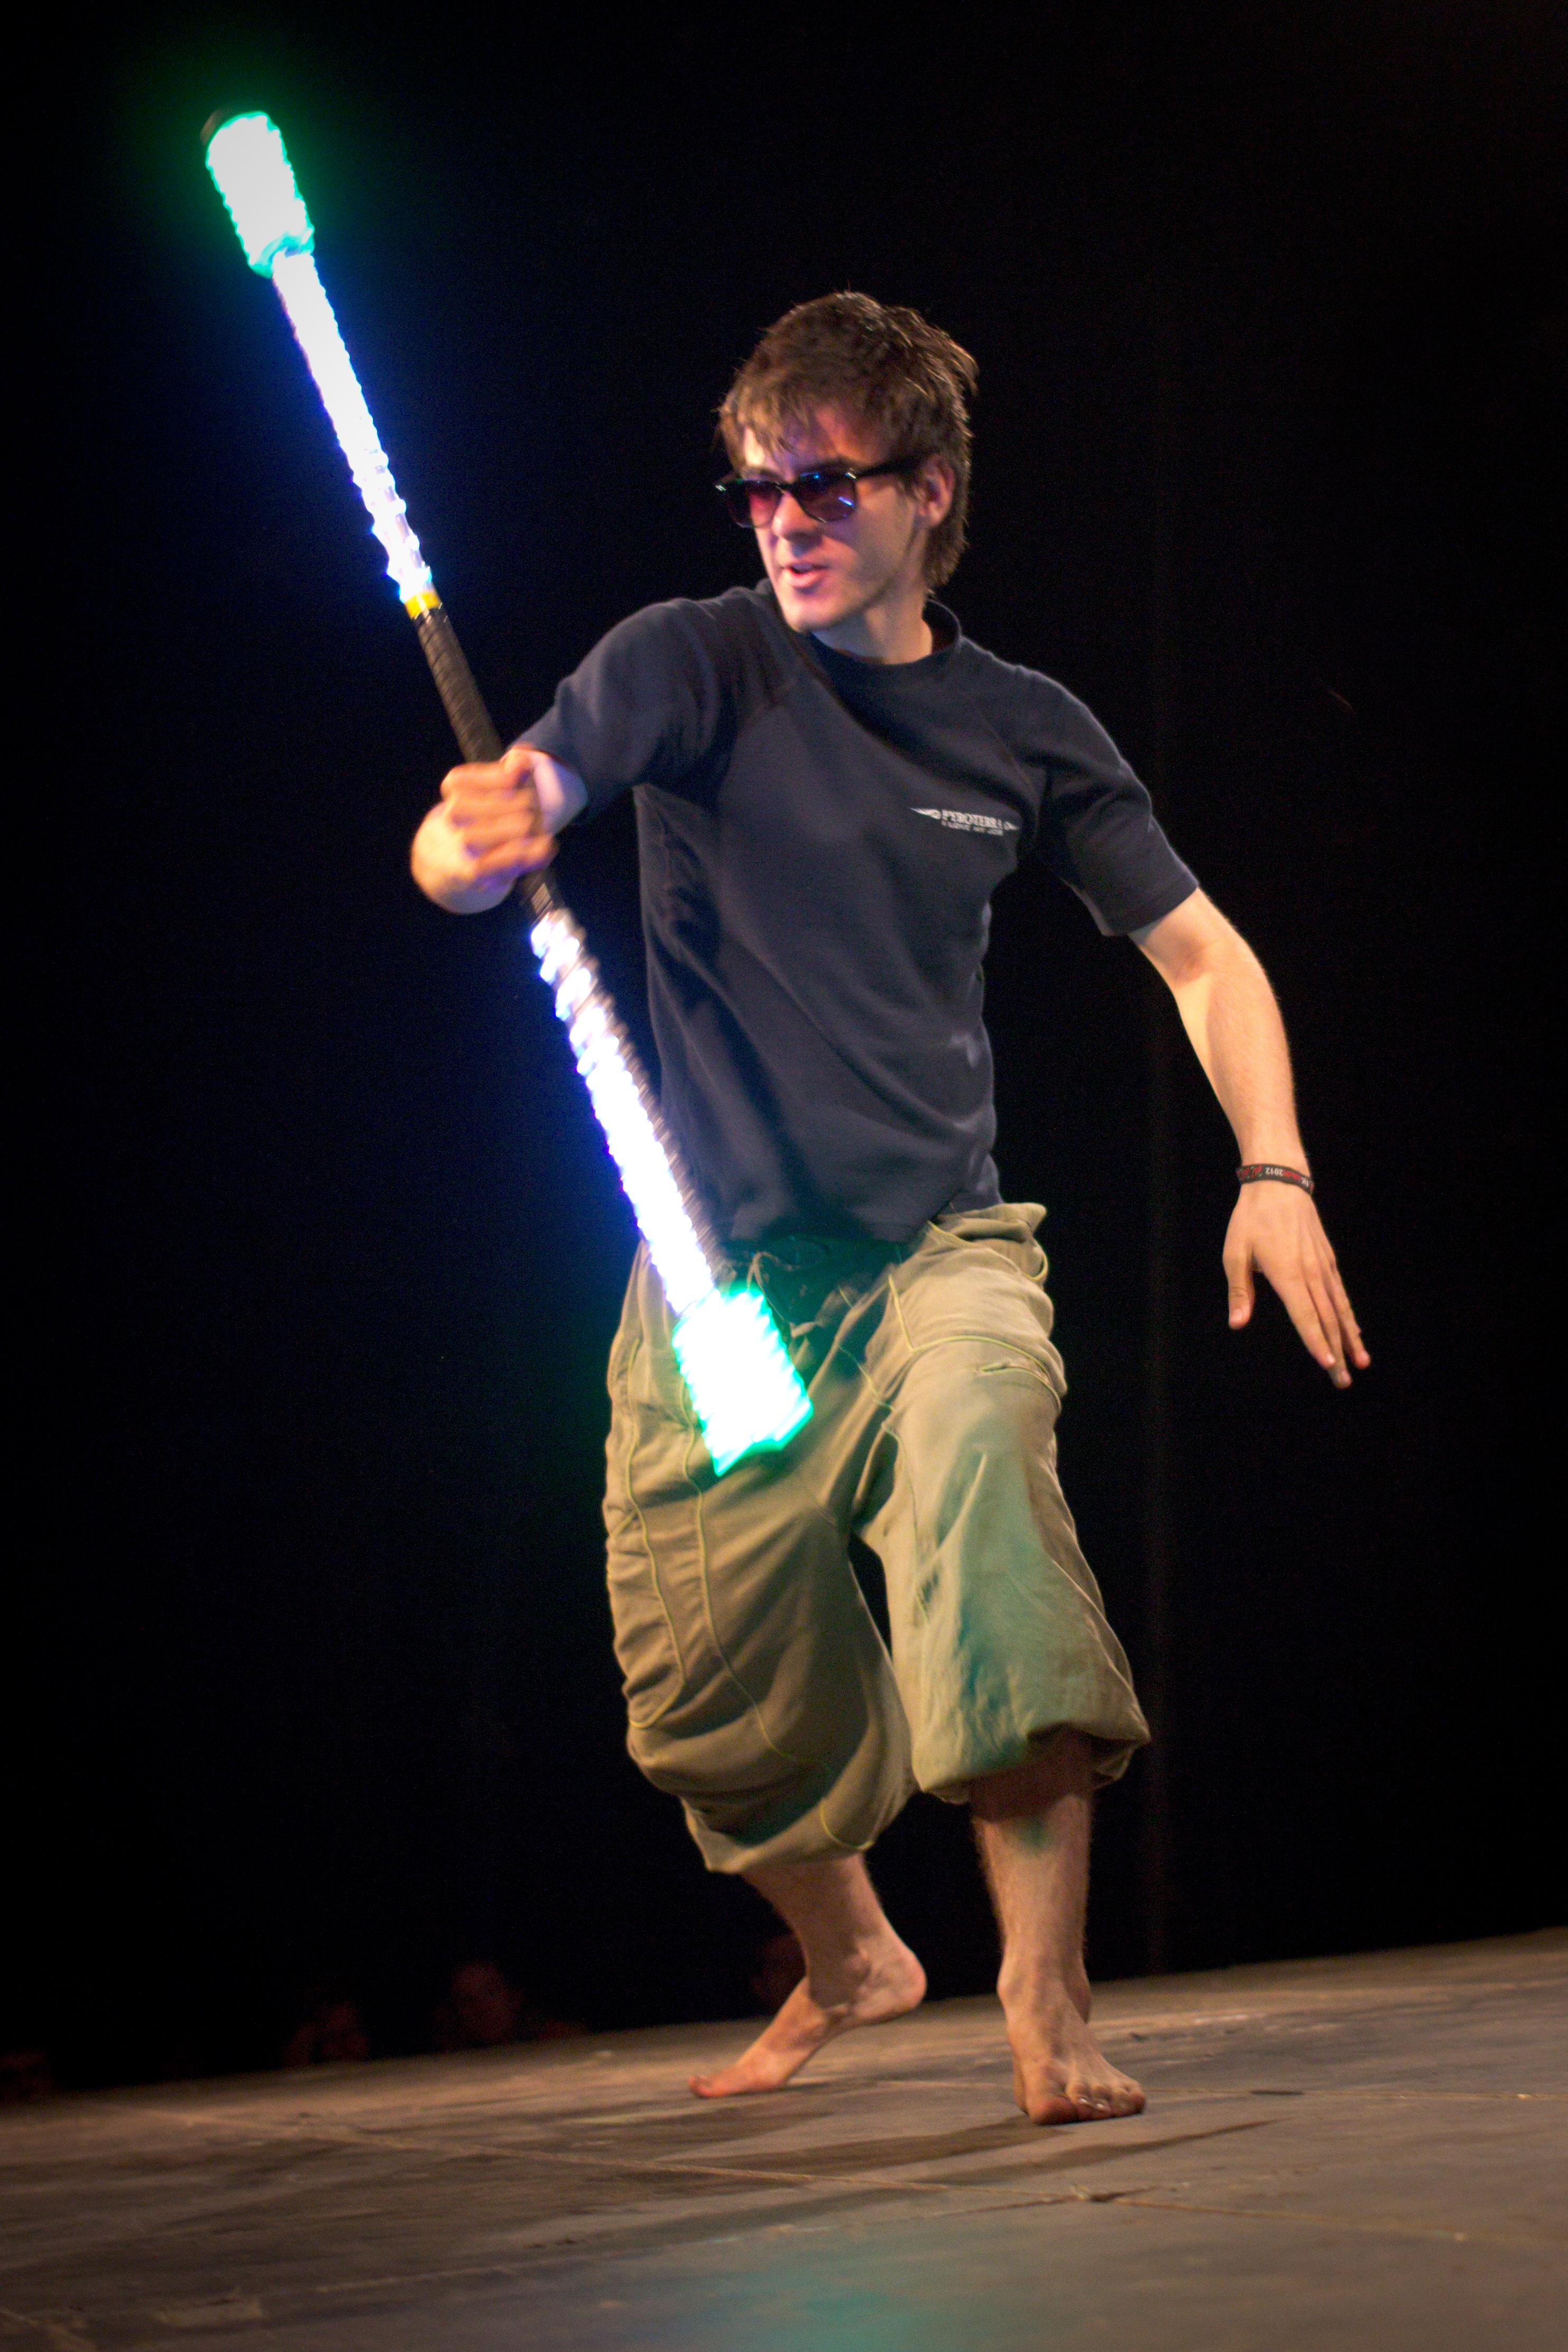 EJC 2012 day 4: Juggle Slam!